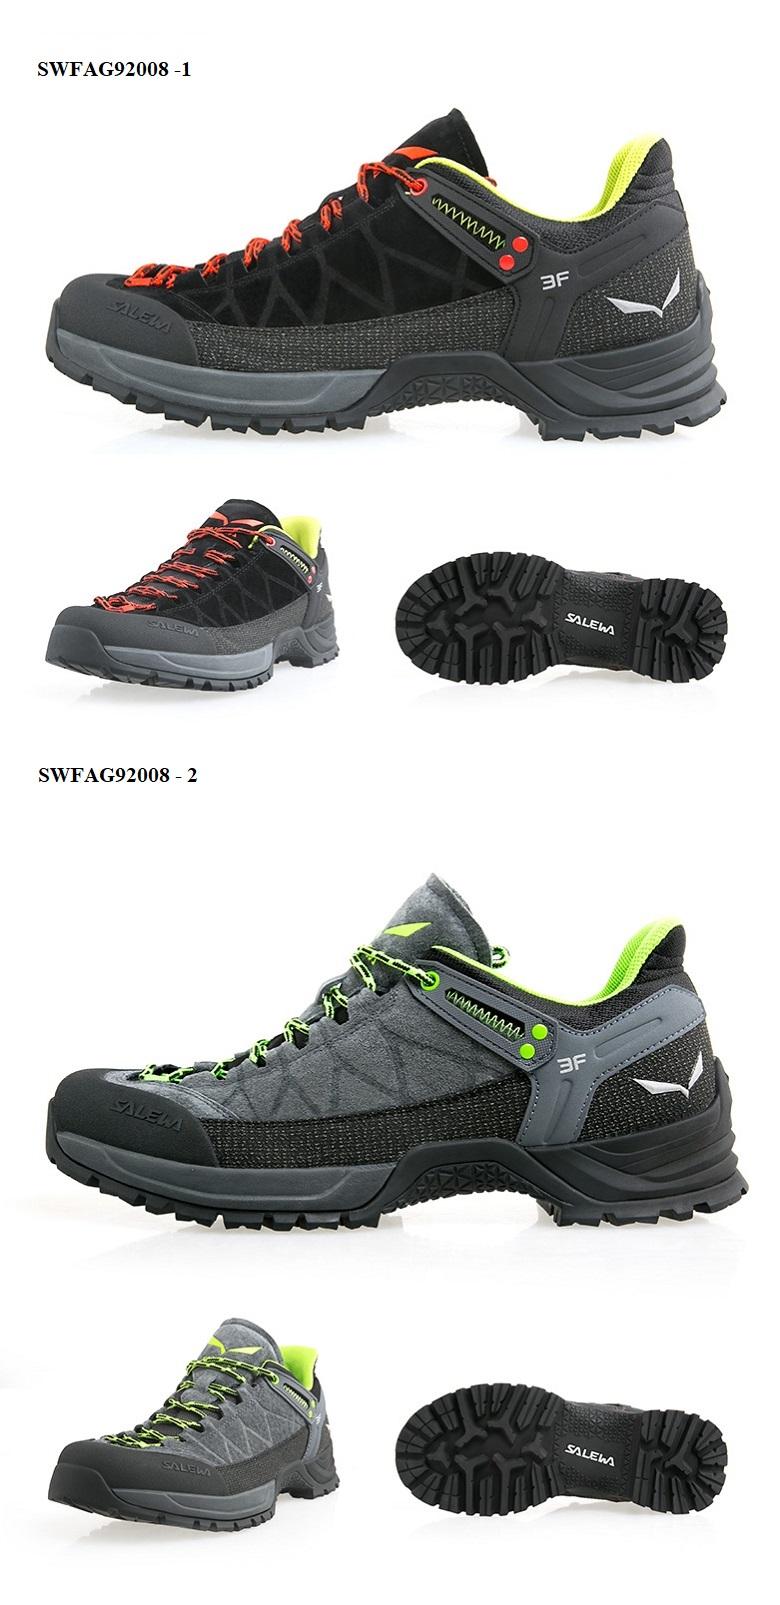 Giày leo núi nữ chống trượt Salewa SWFAG92008